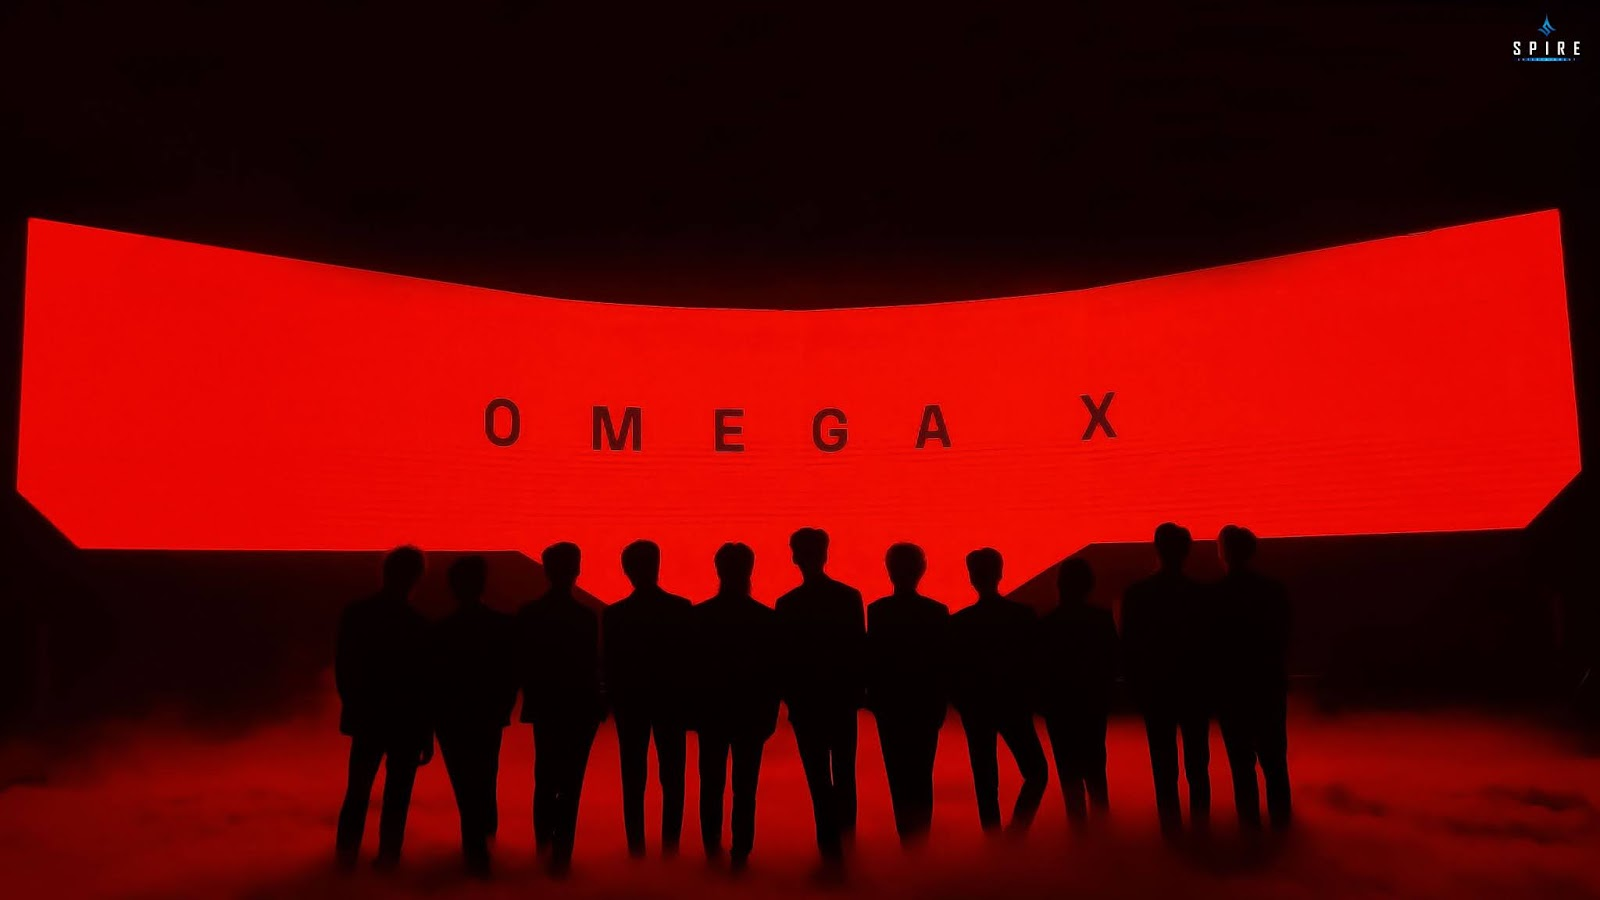 omega x debut